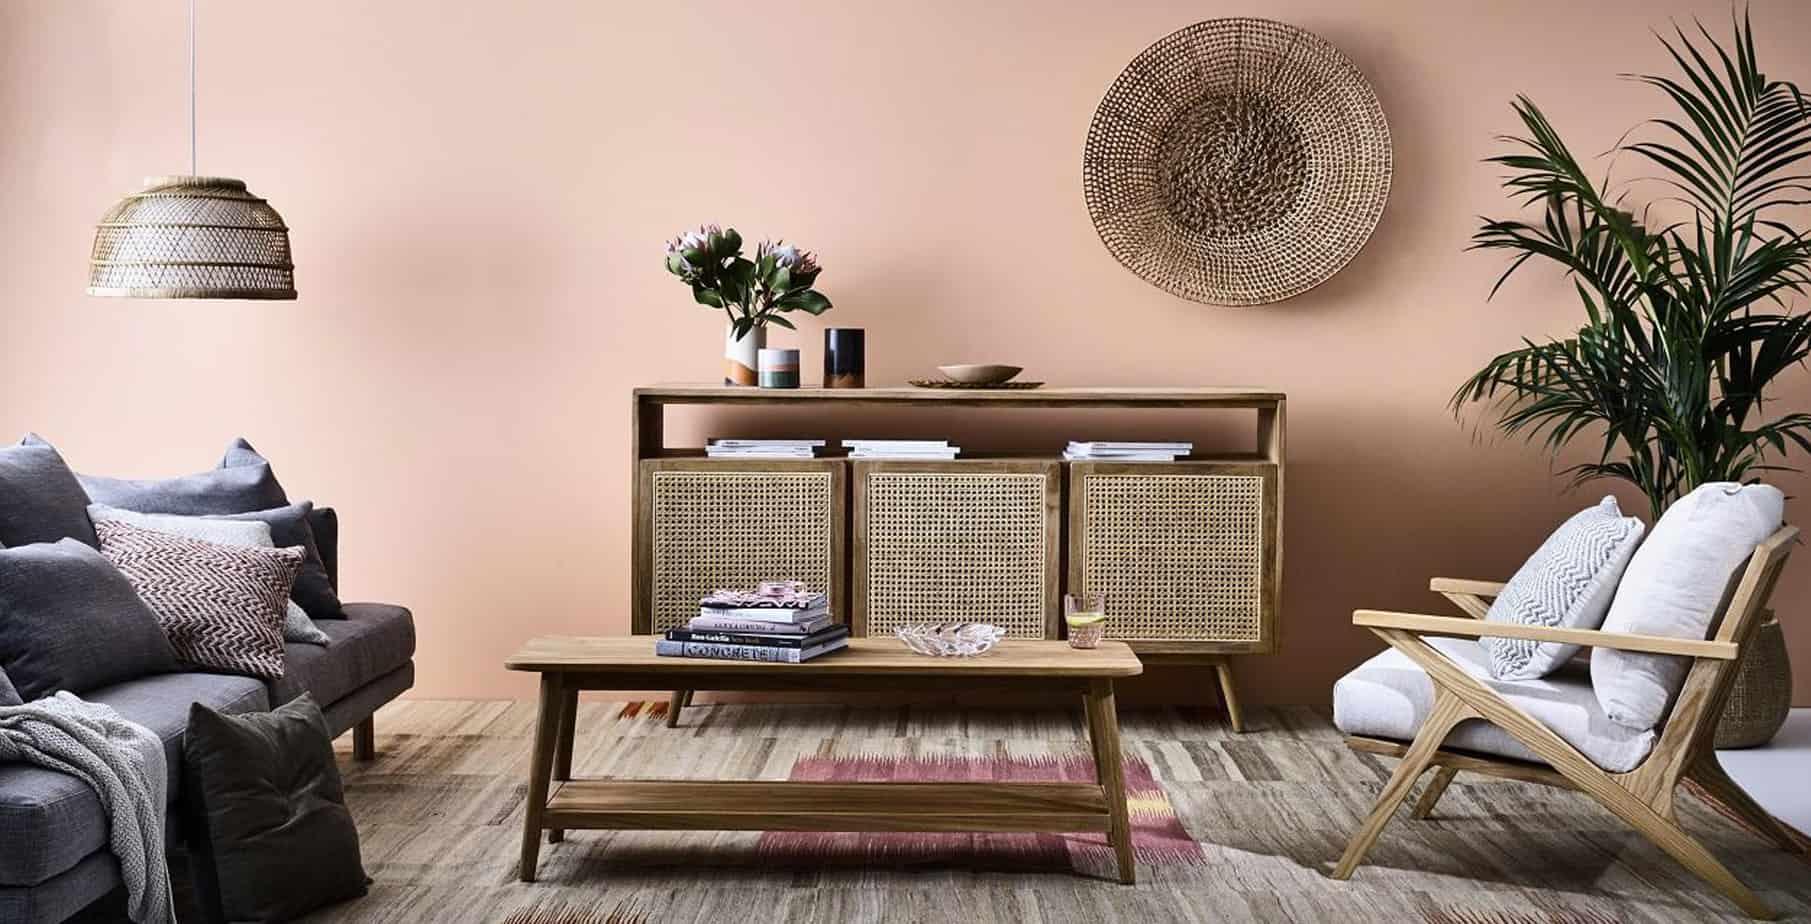 best living room furniture trends 2021 rattan, wicker, cane furniture